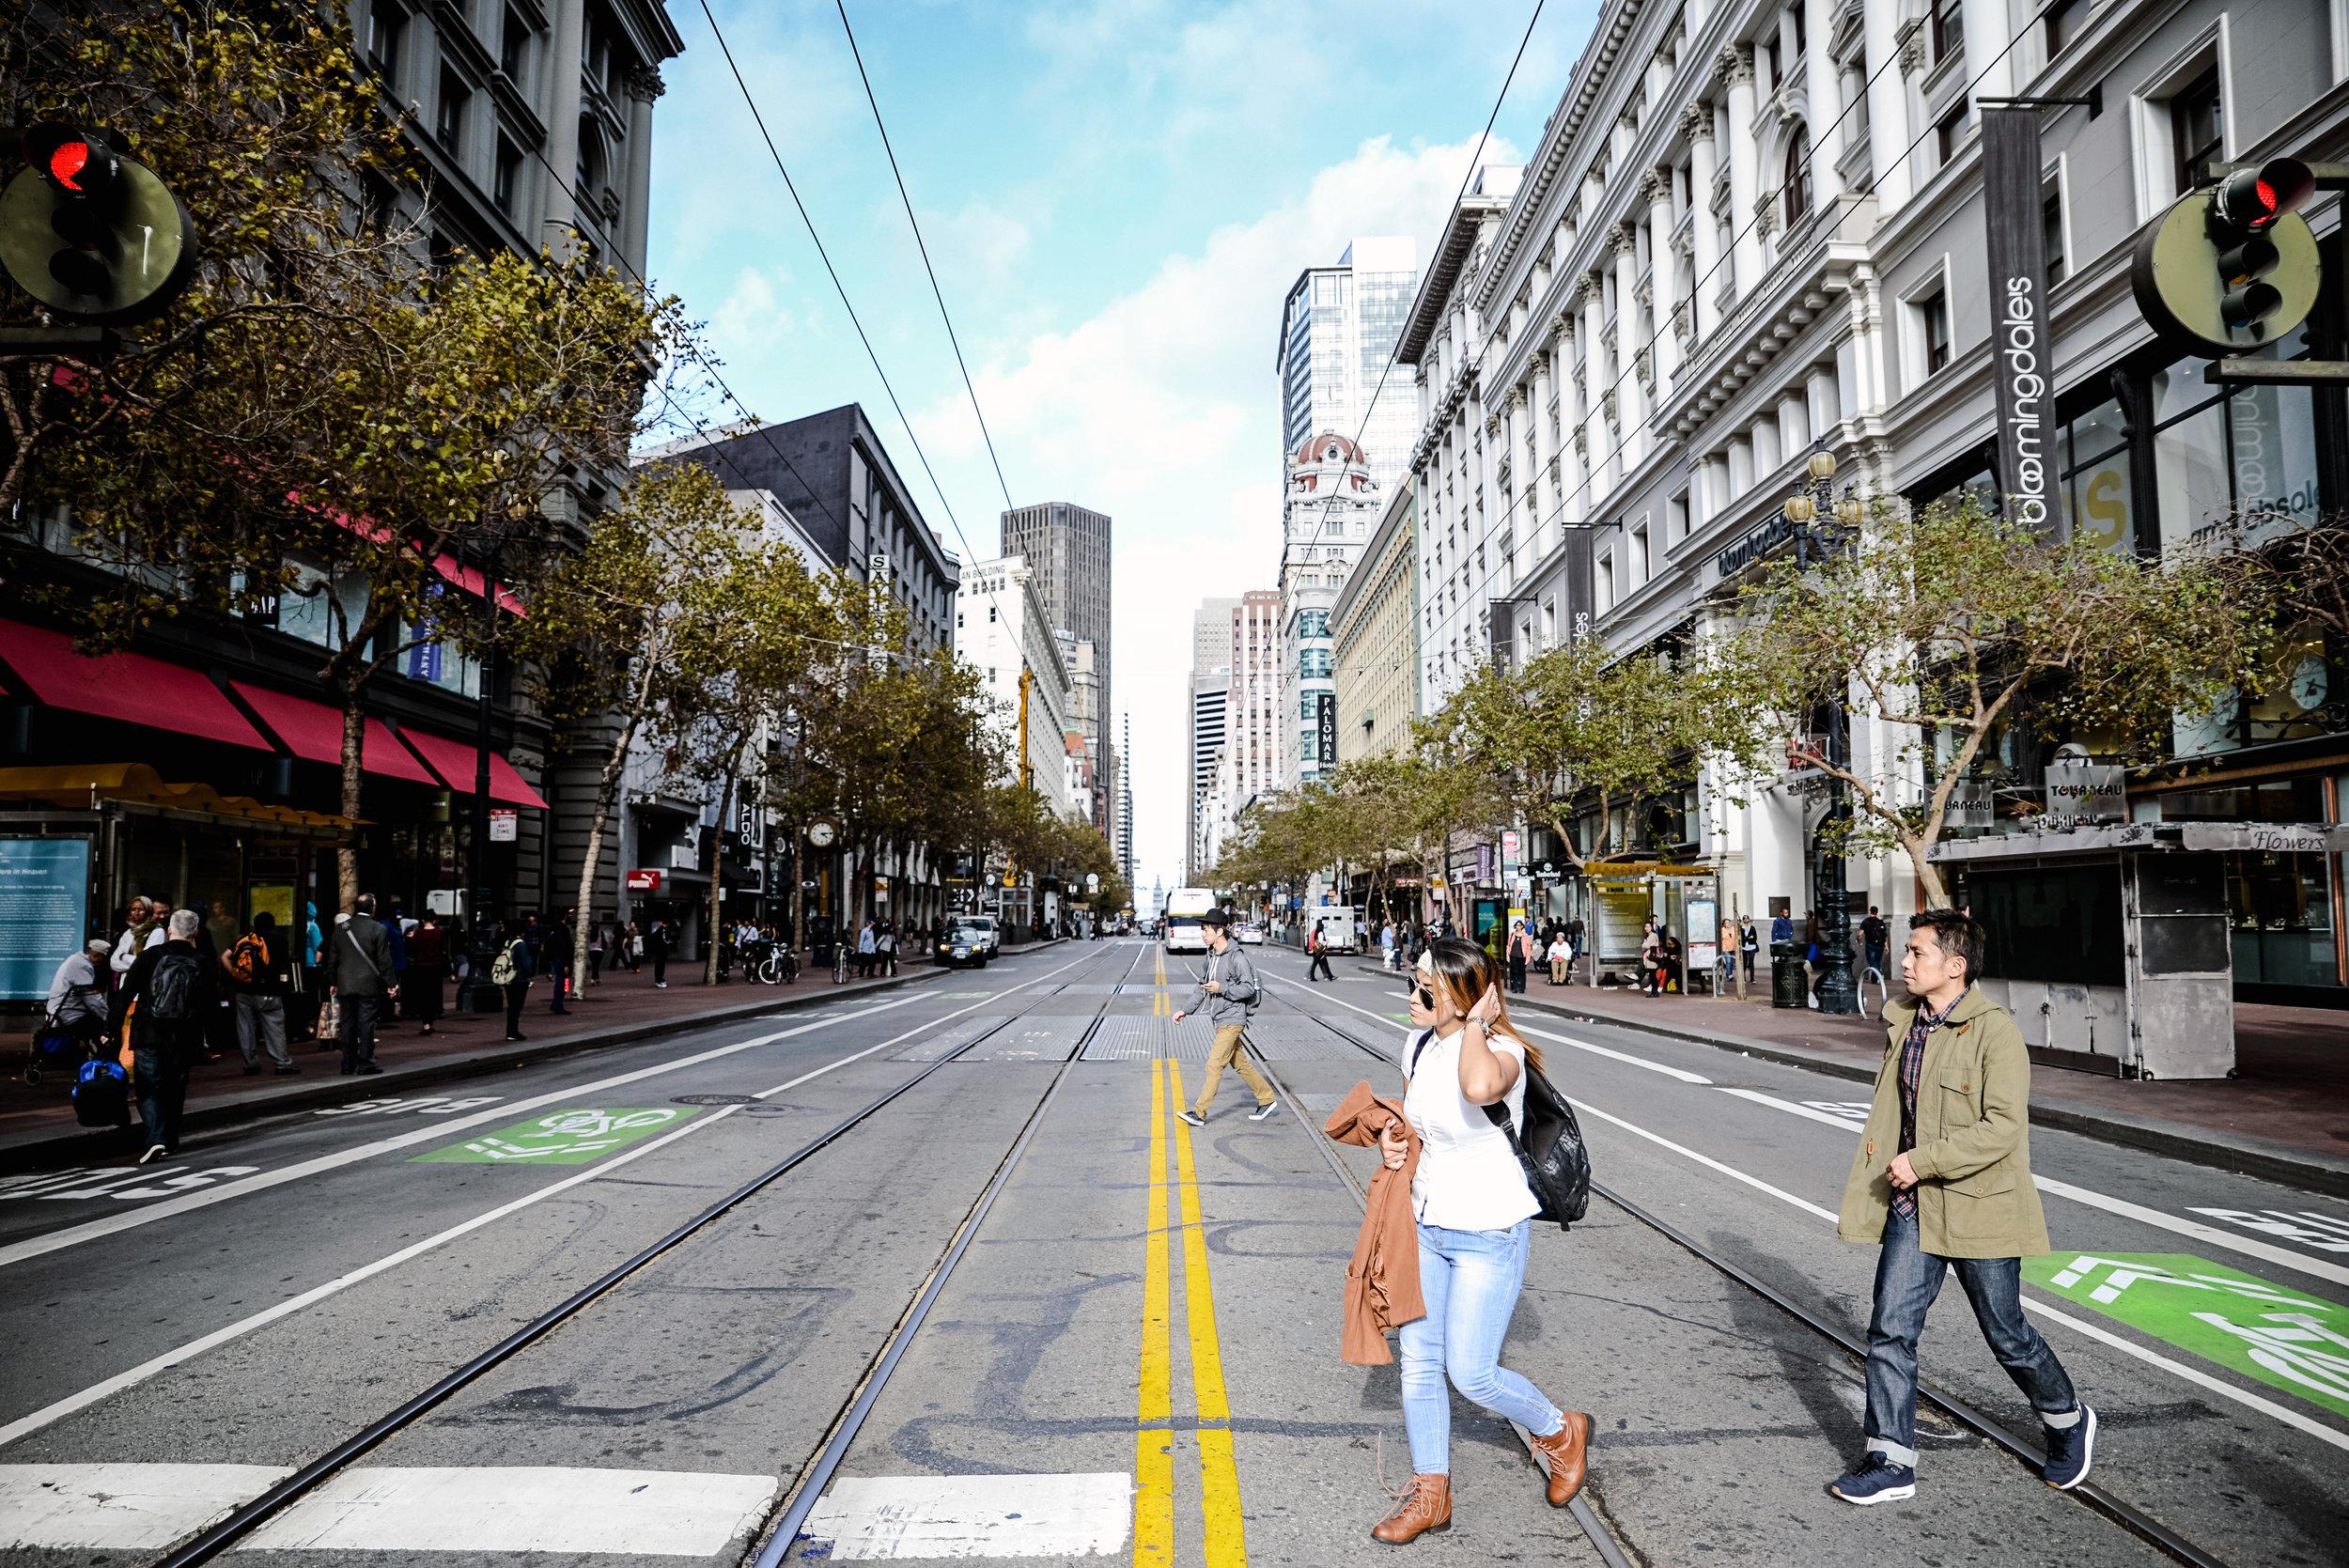 Market Street @ Union Square